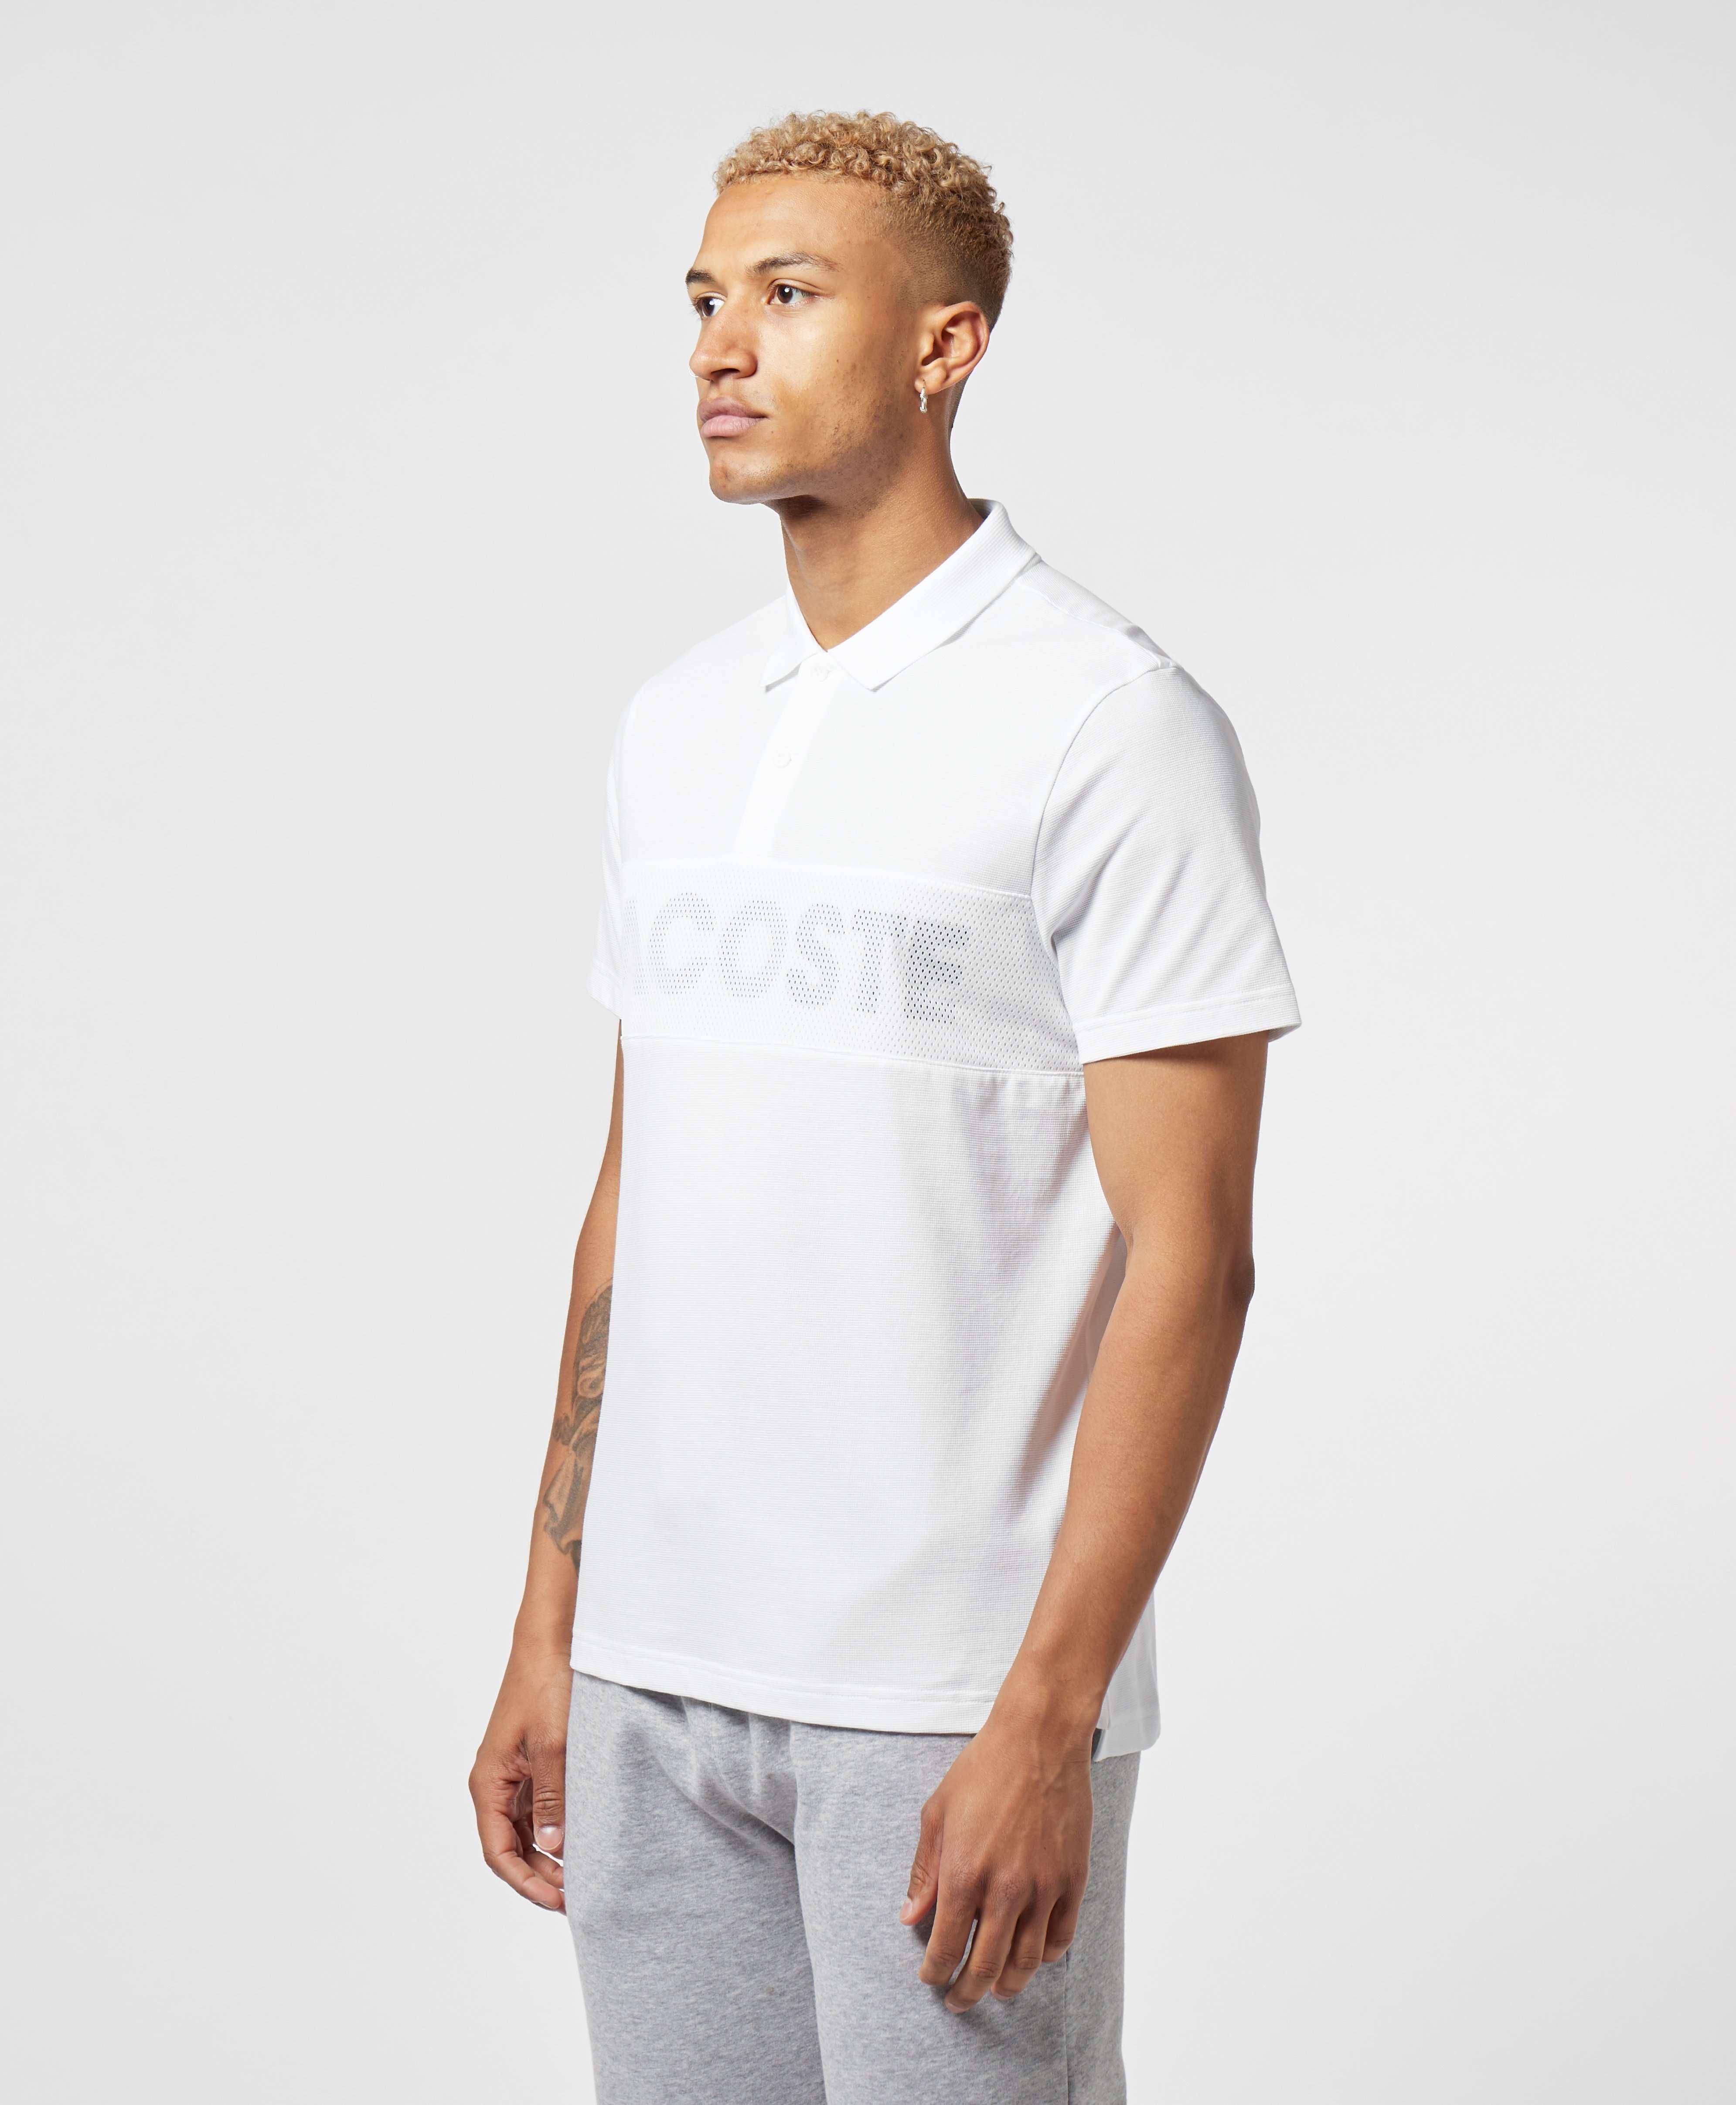 Lacoste Mesh Logo Short Sleeve Polo Shirt - Exclusive